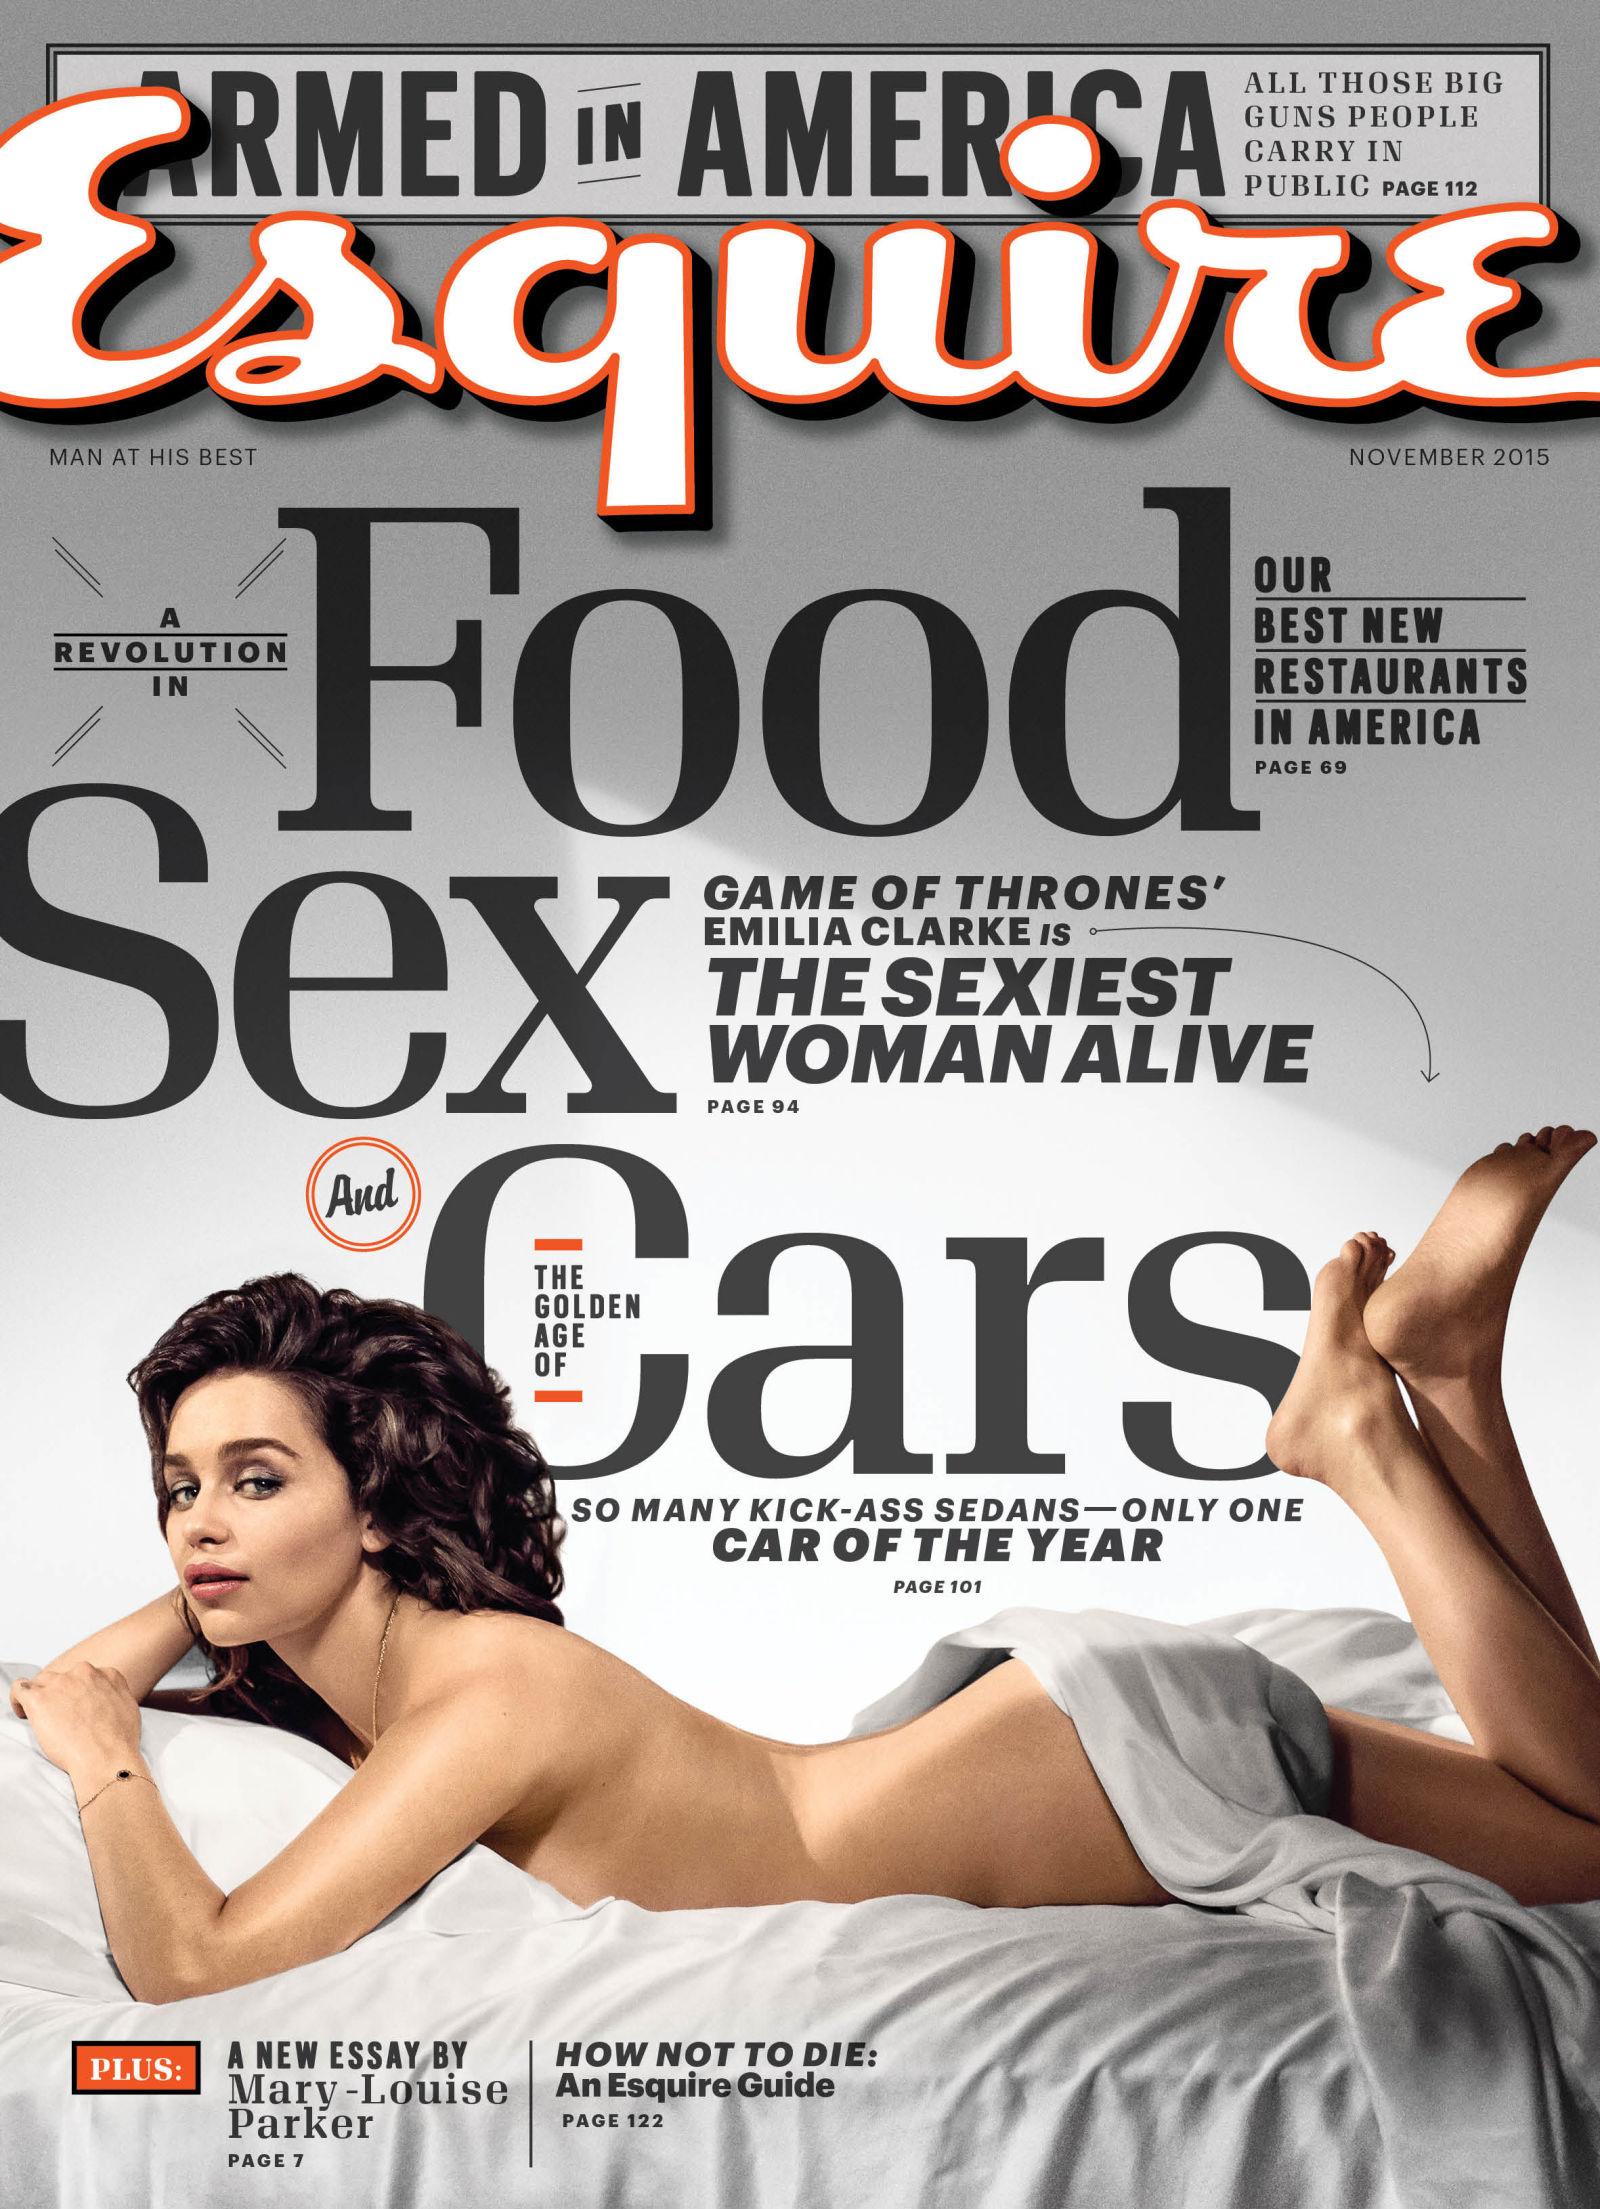 gallery-1444418152-emilia-clarke-sexiest-woman-alive-2015-cover.jpeg